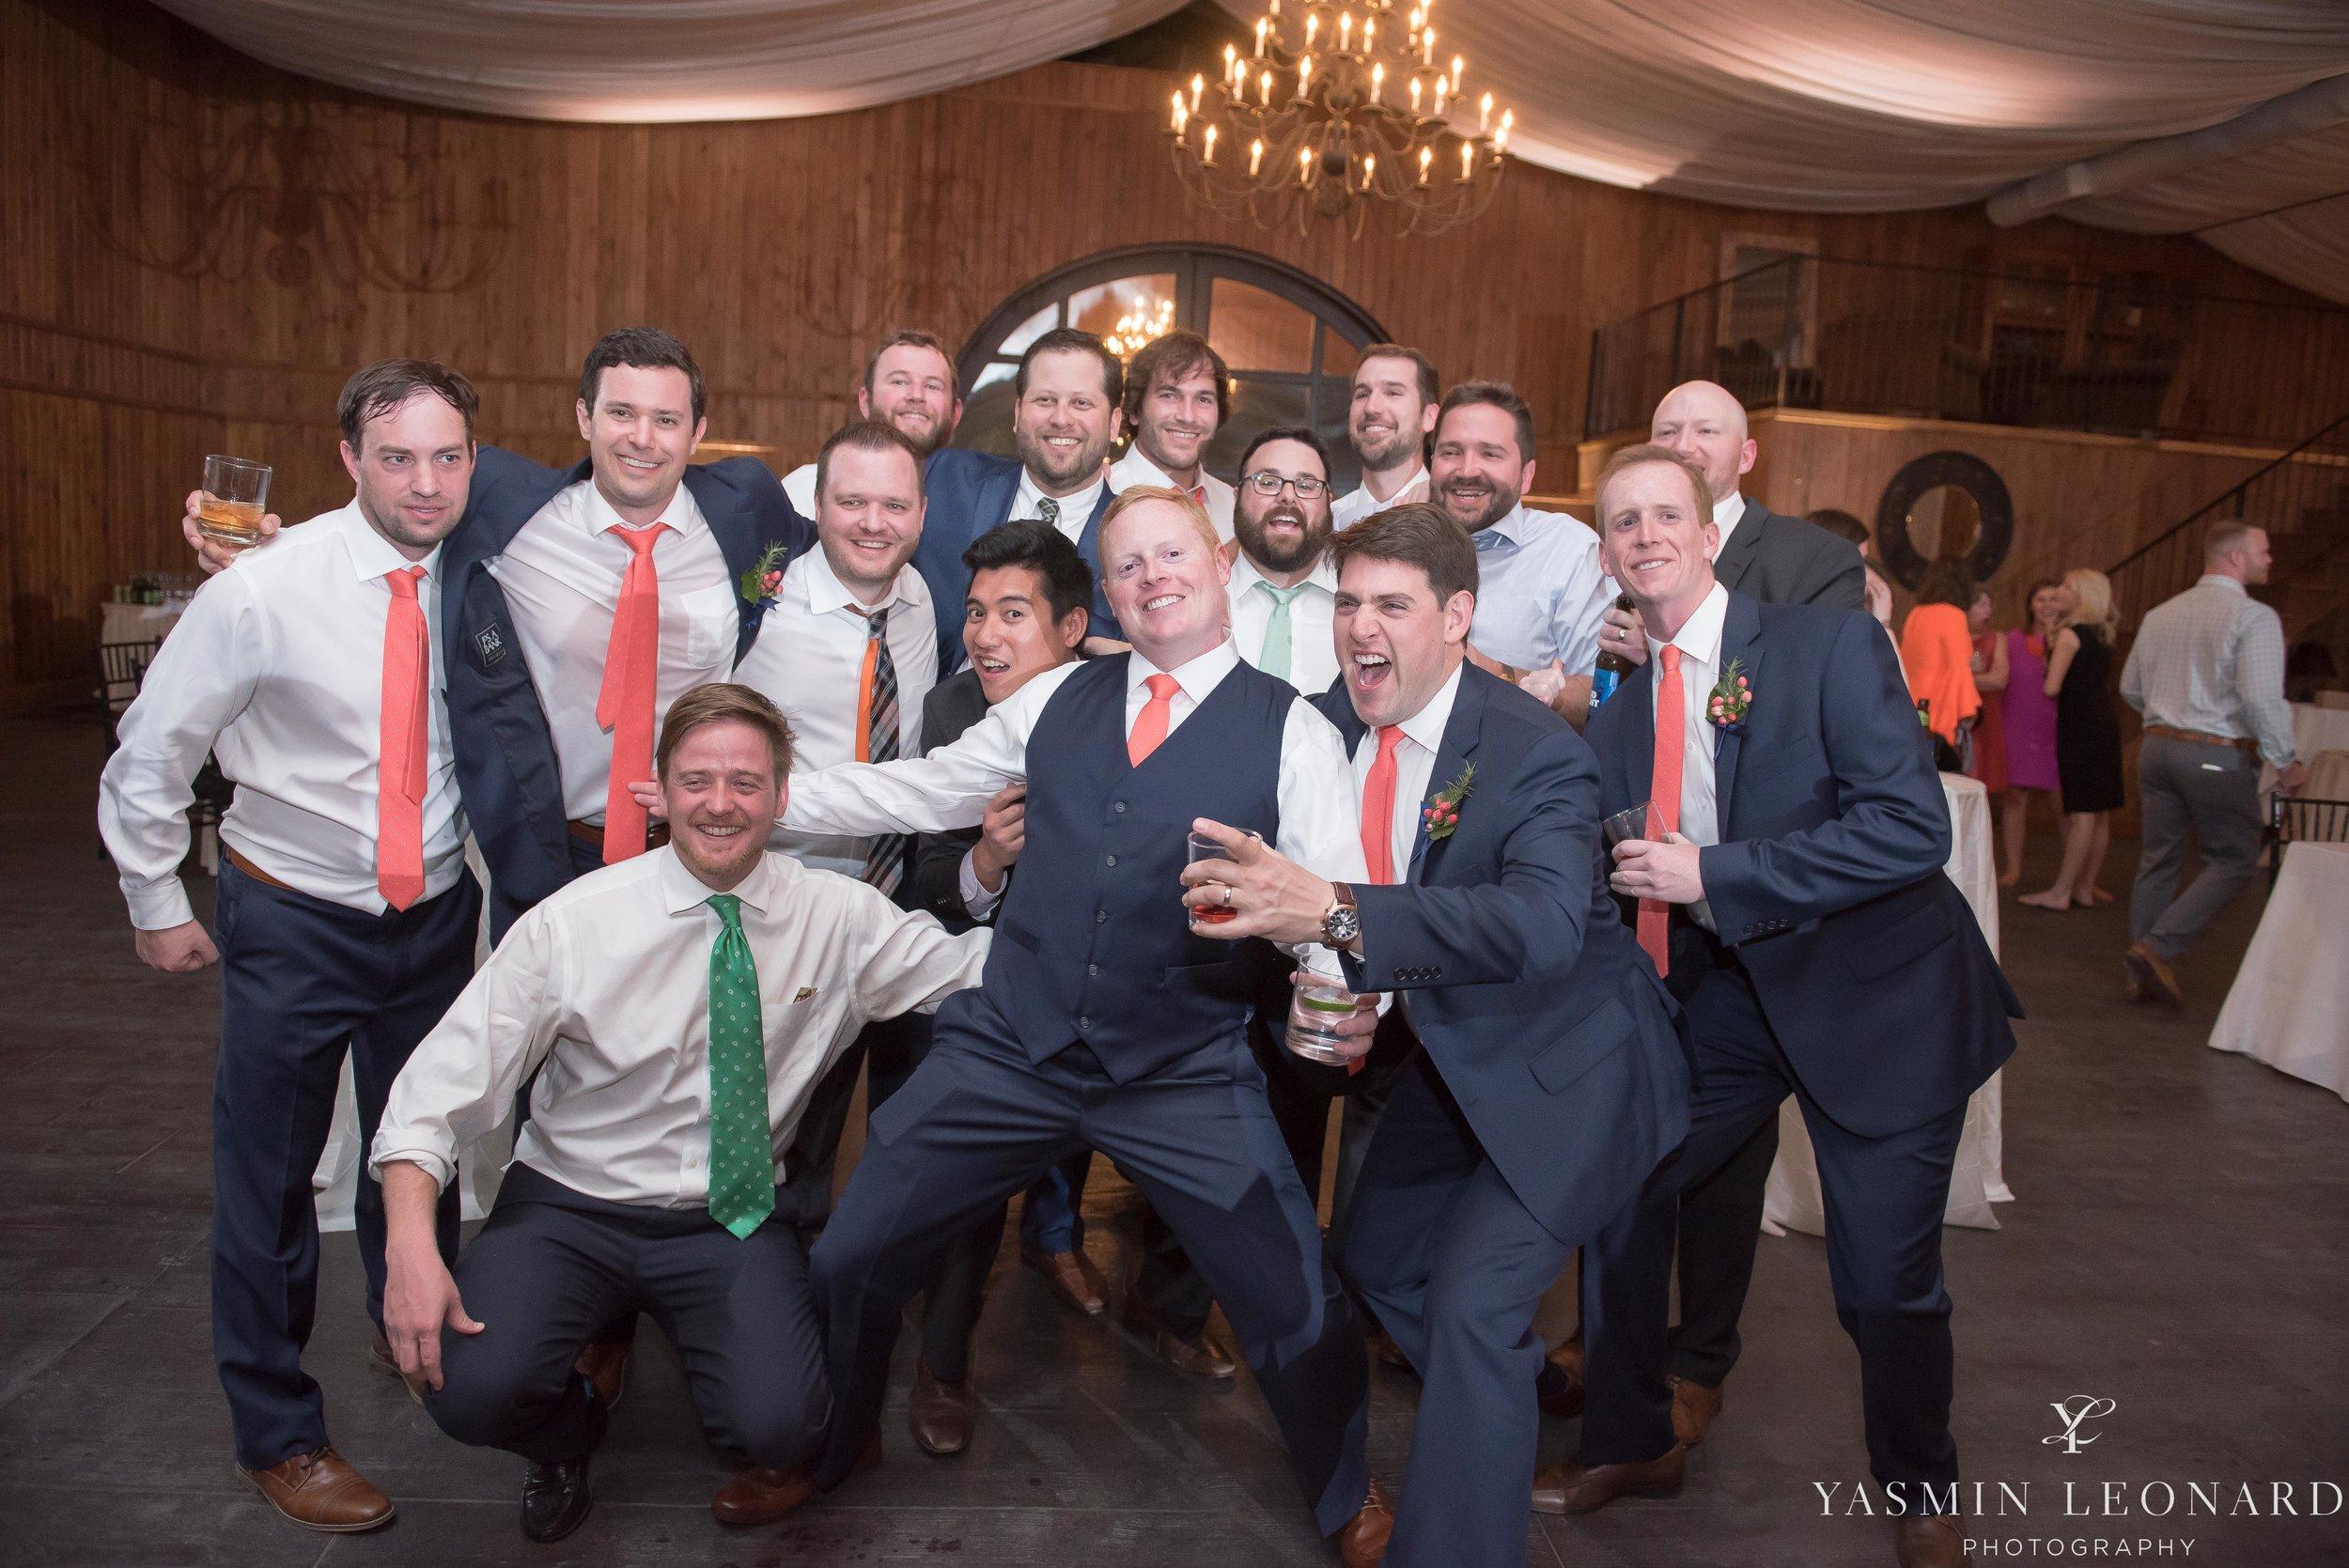 Adaumont Farm - Adaumont Farm Weddings - Trinity Weddings - NC Weddings - Yasmin Leonard Photography-104.jpg